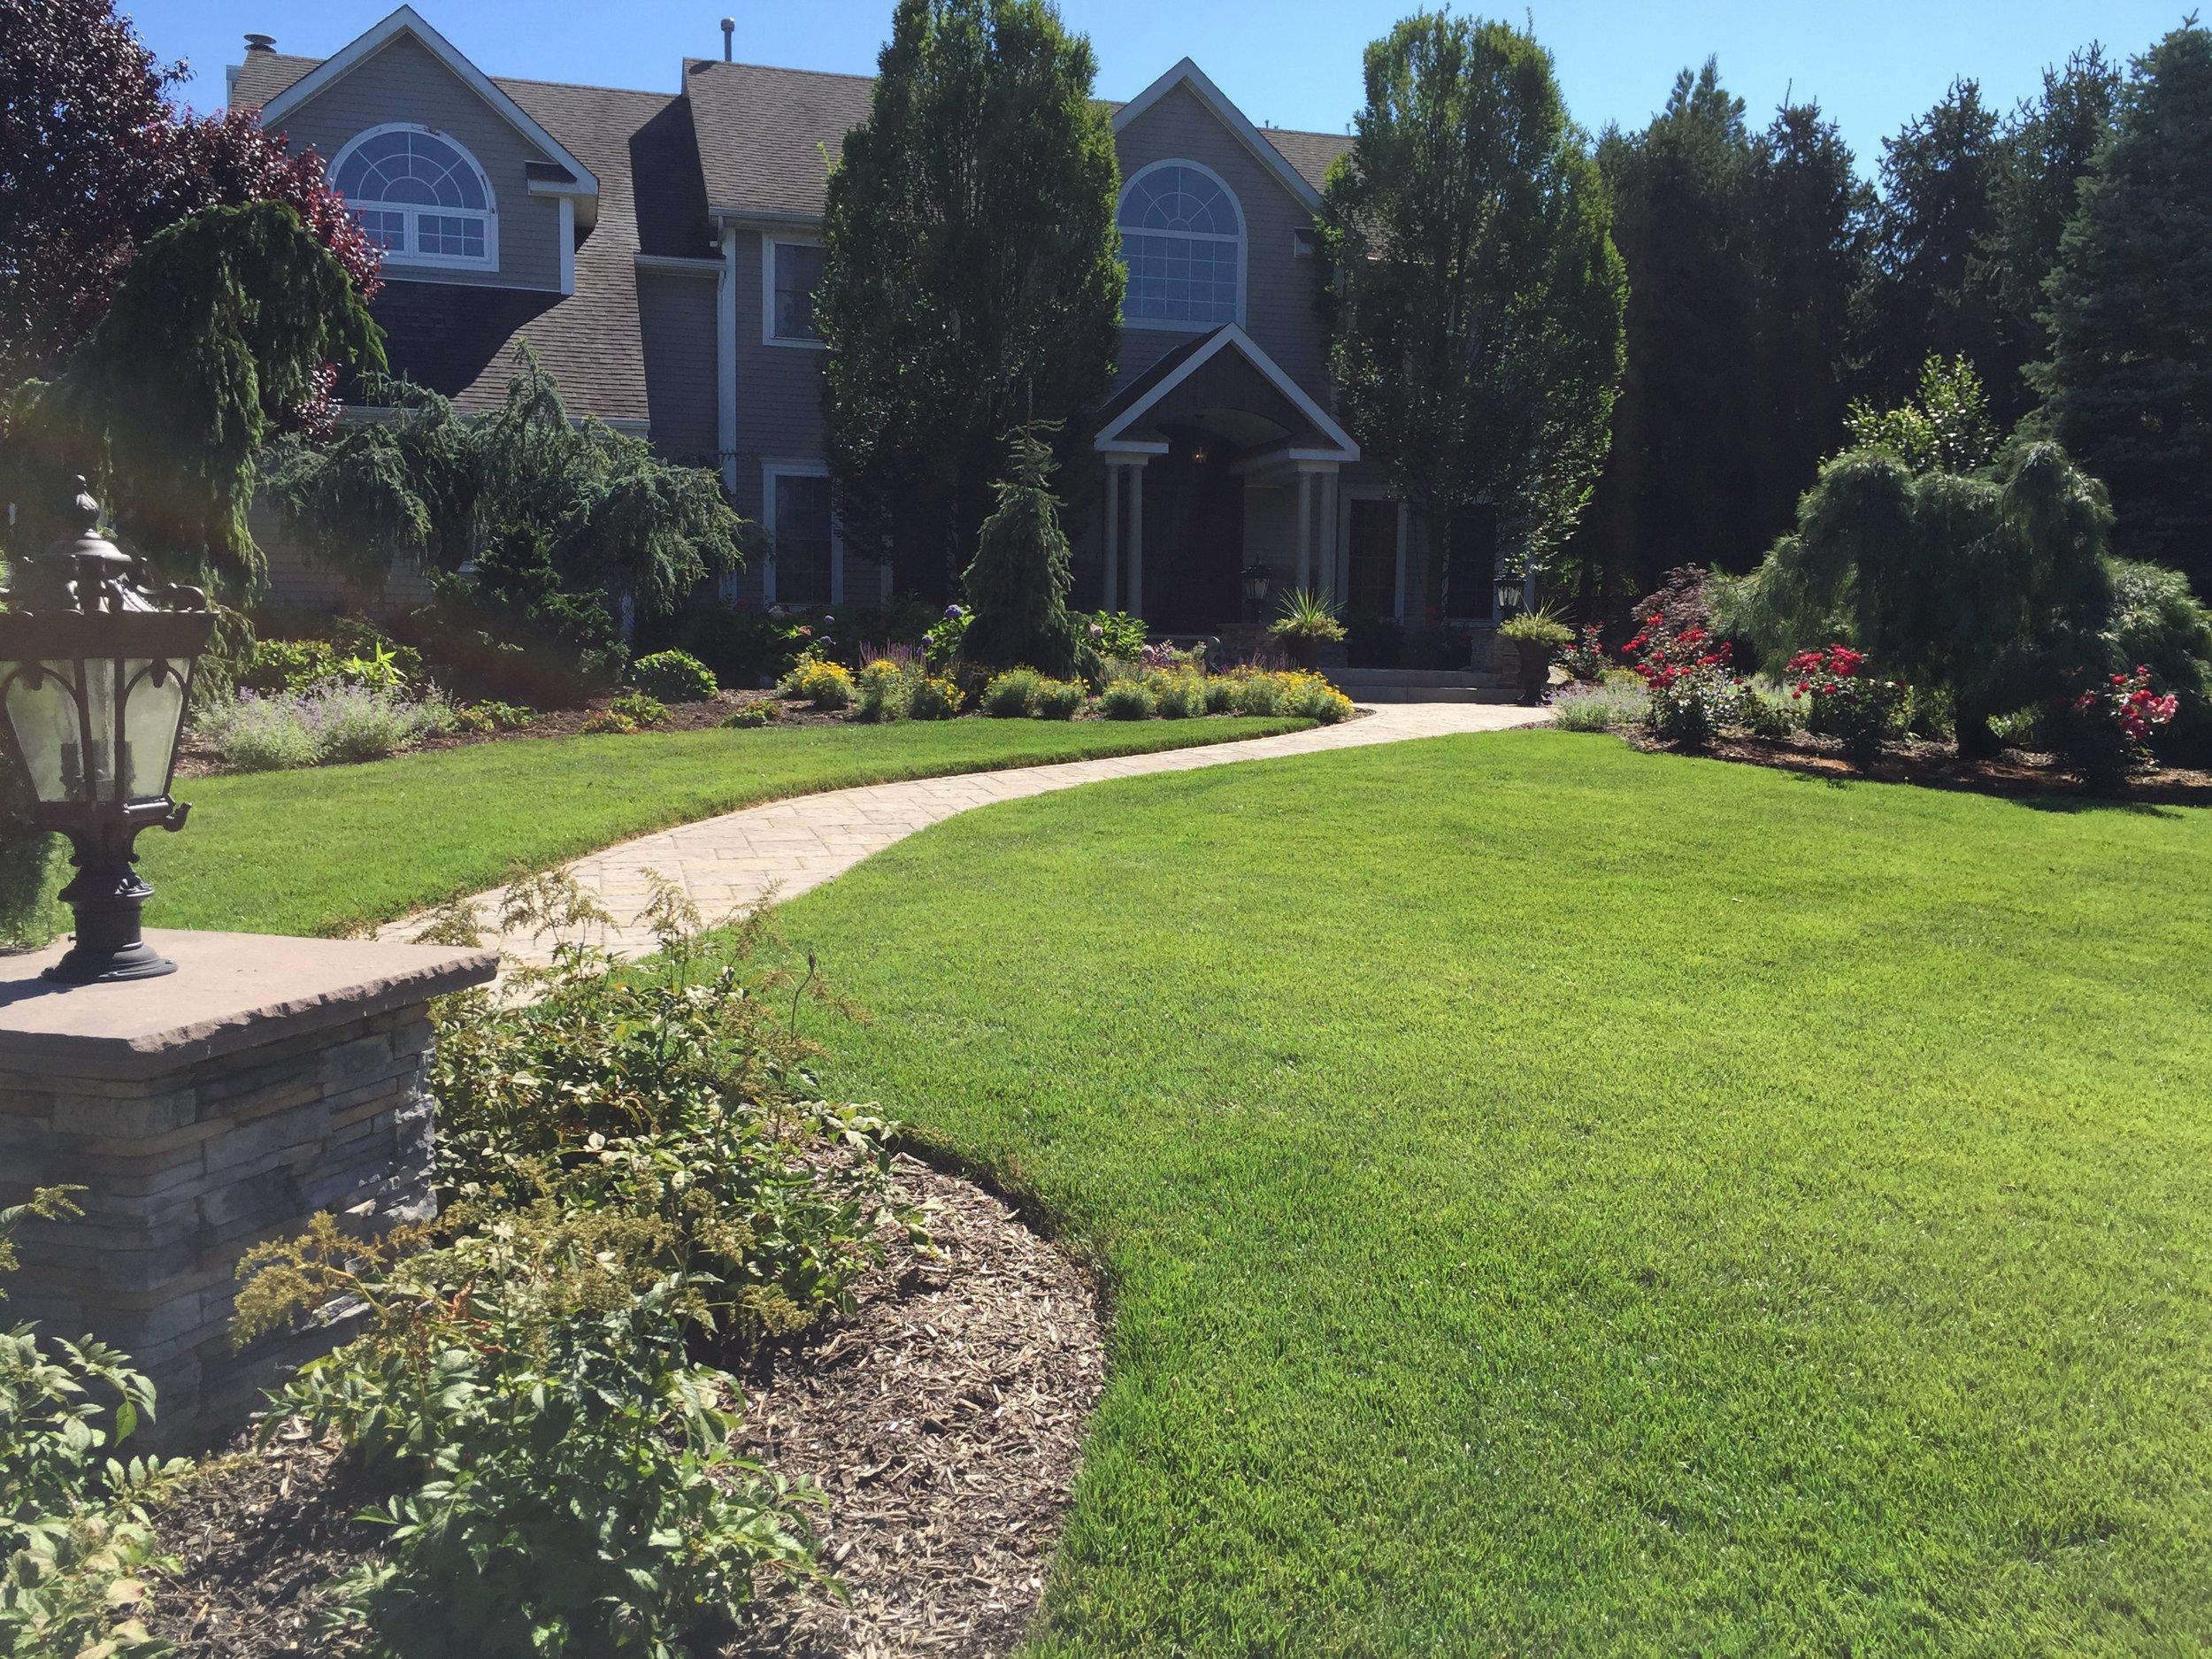 Top walkway planting design company in Long Island, NY